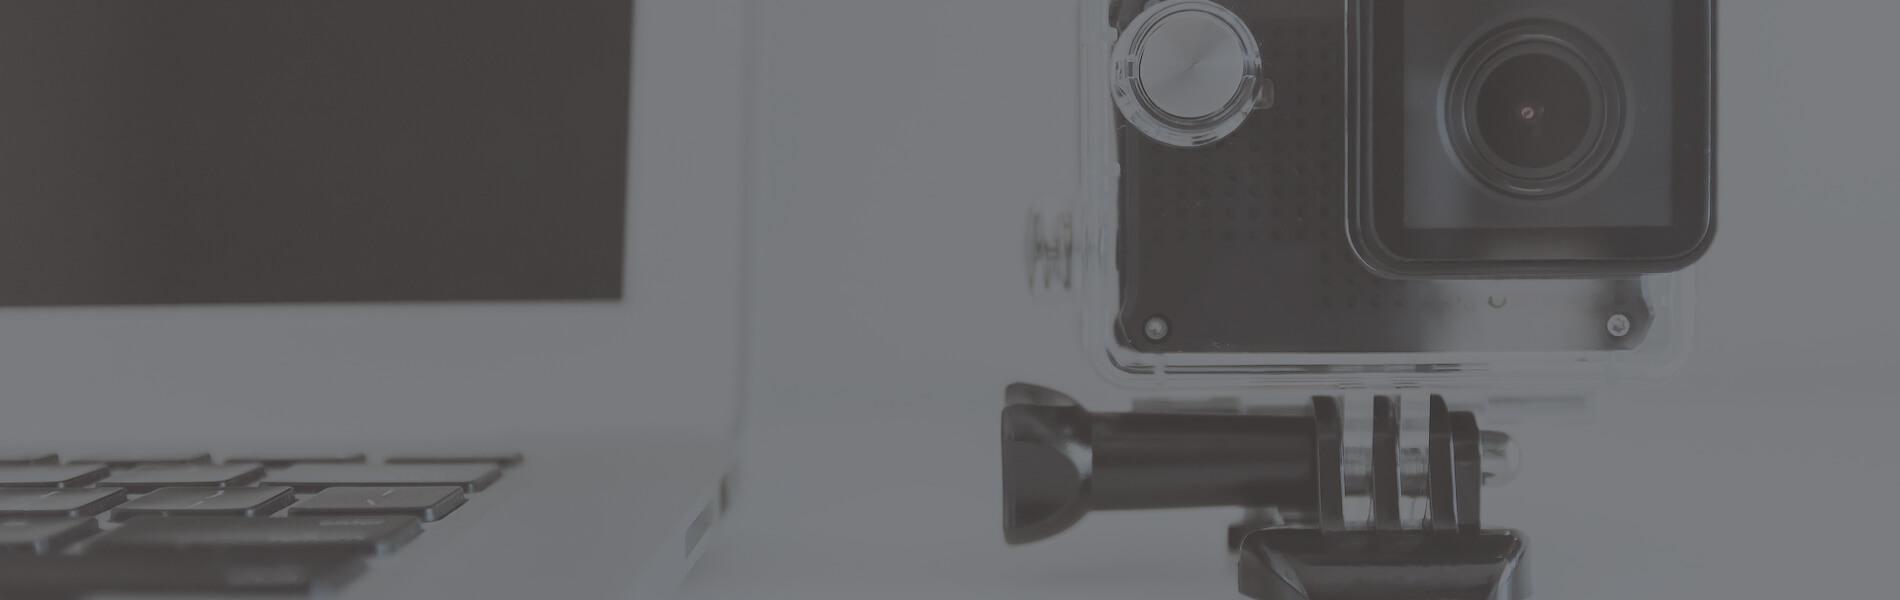 video-resources-era-environmental